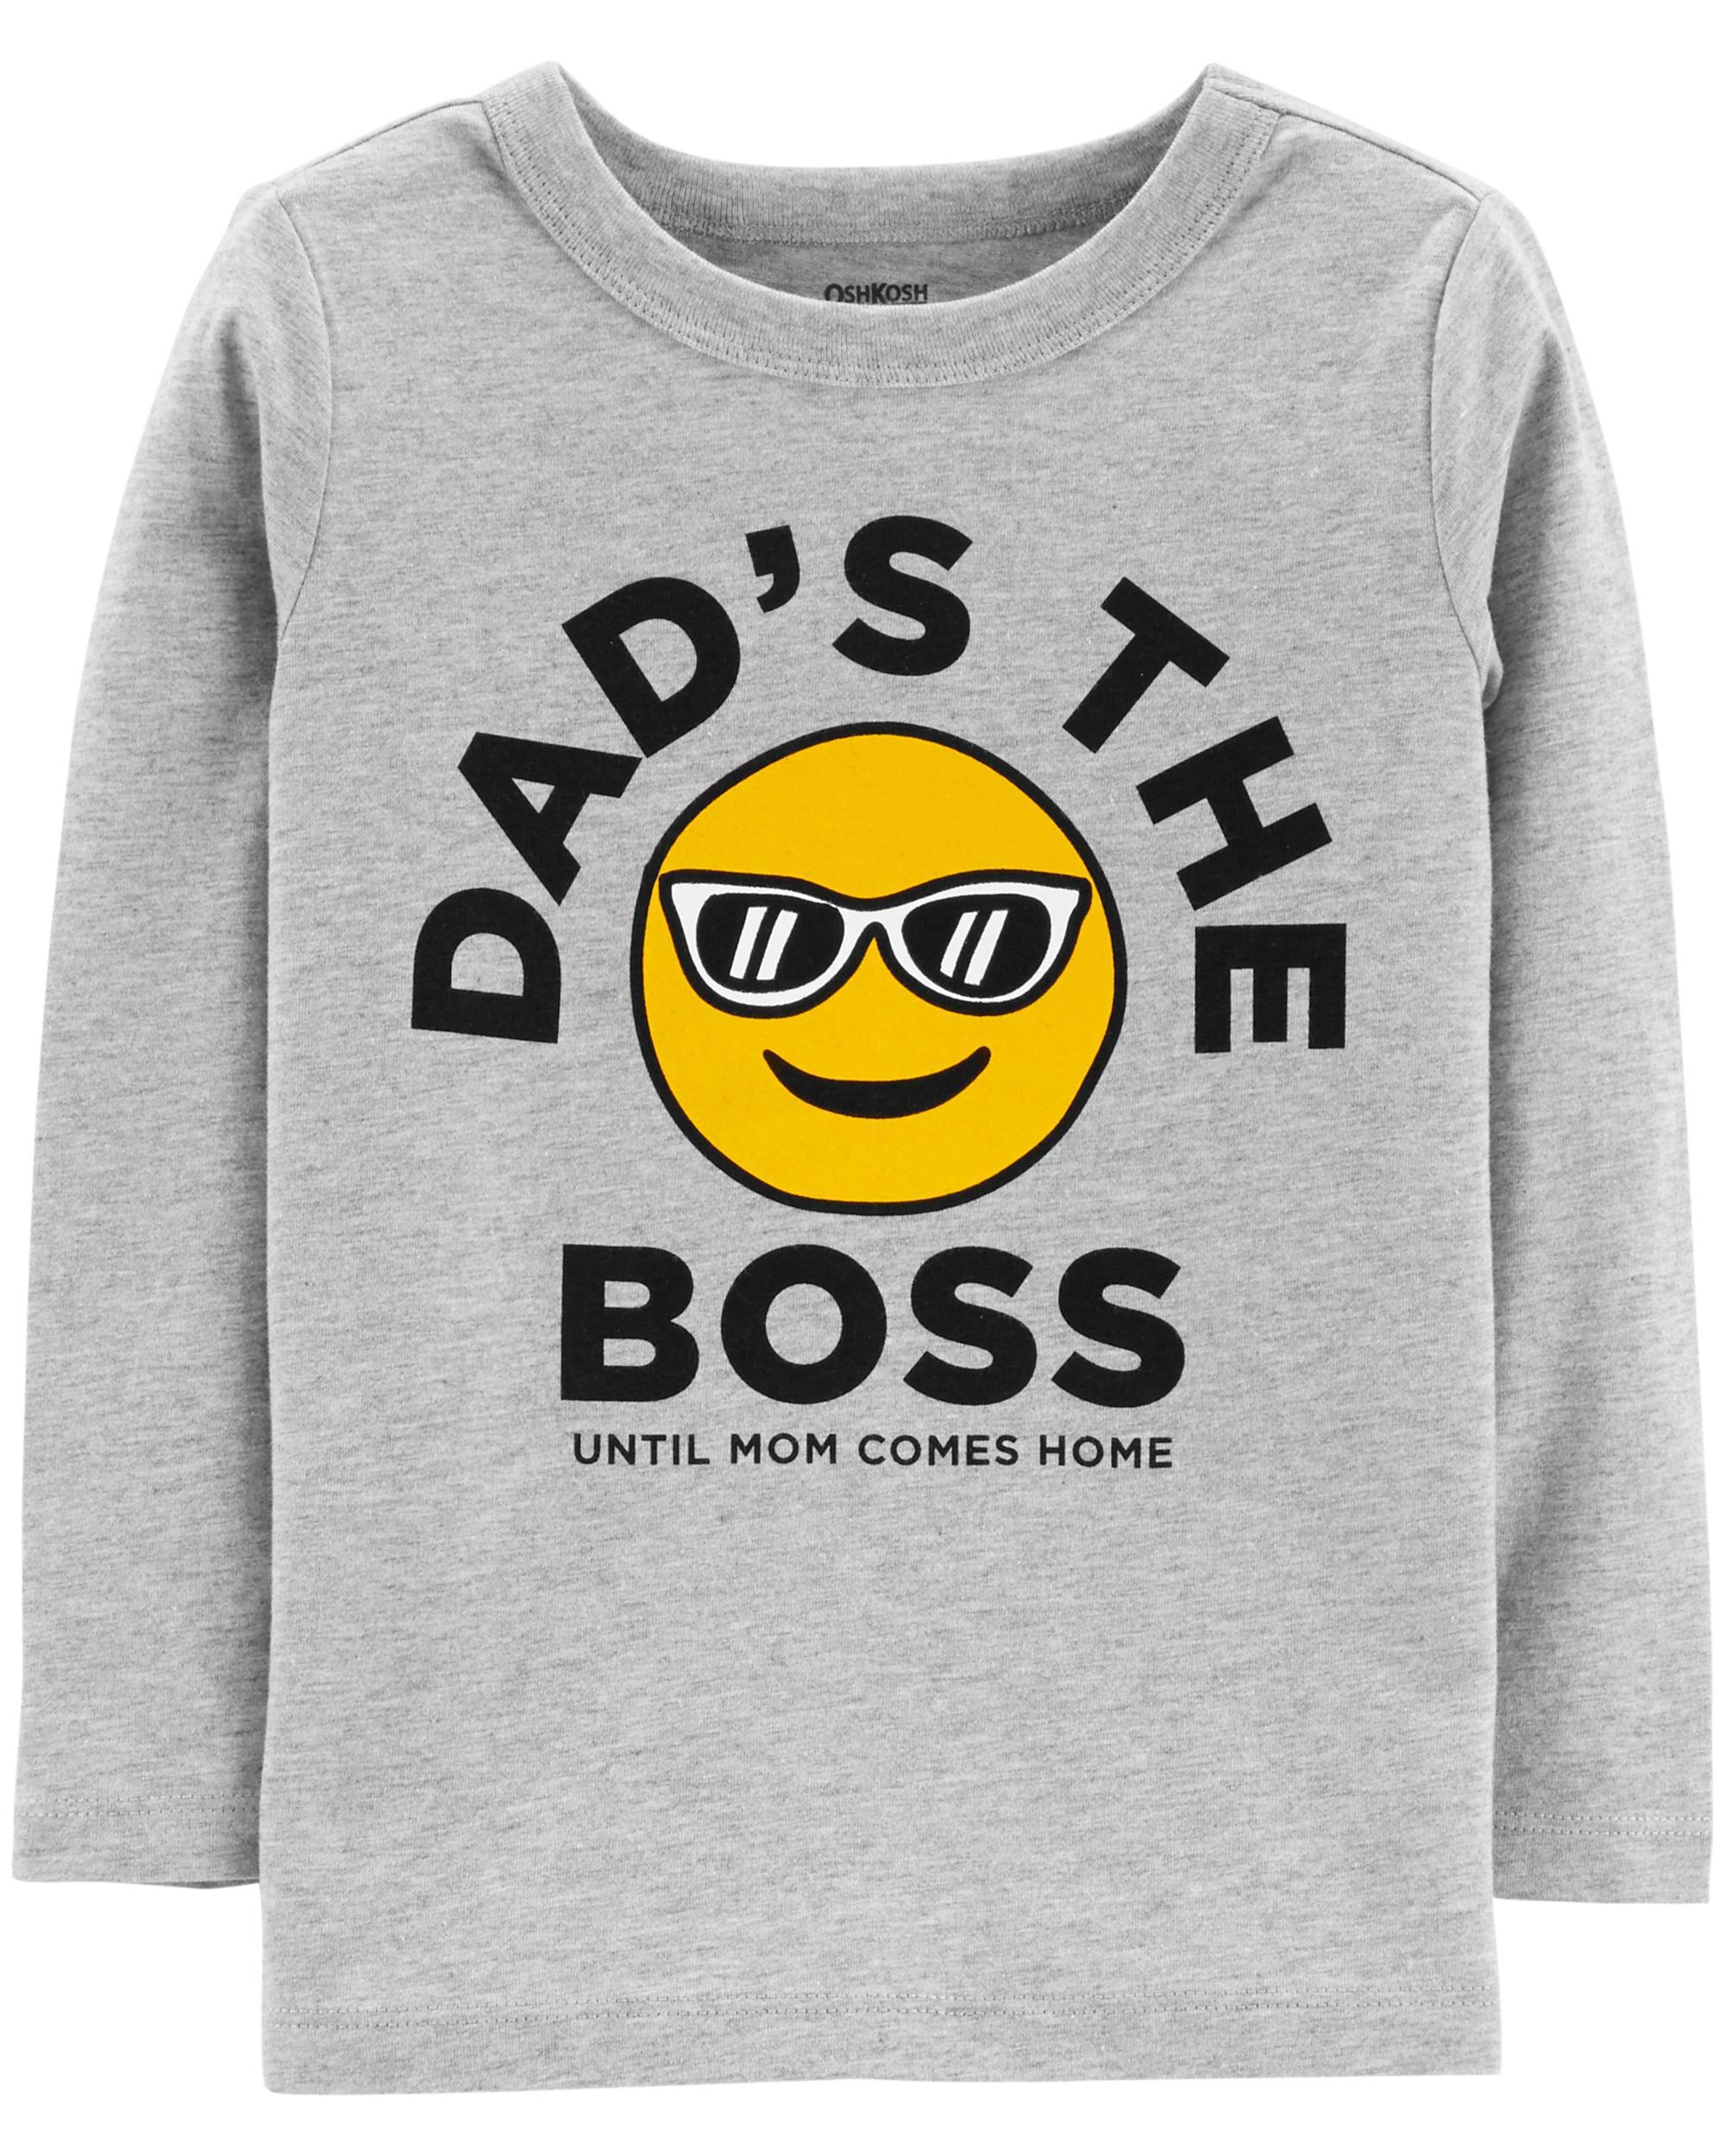 Boss Baby Style 1 Personalized Shirt Birthday